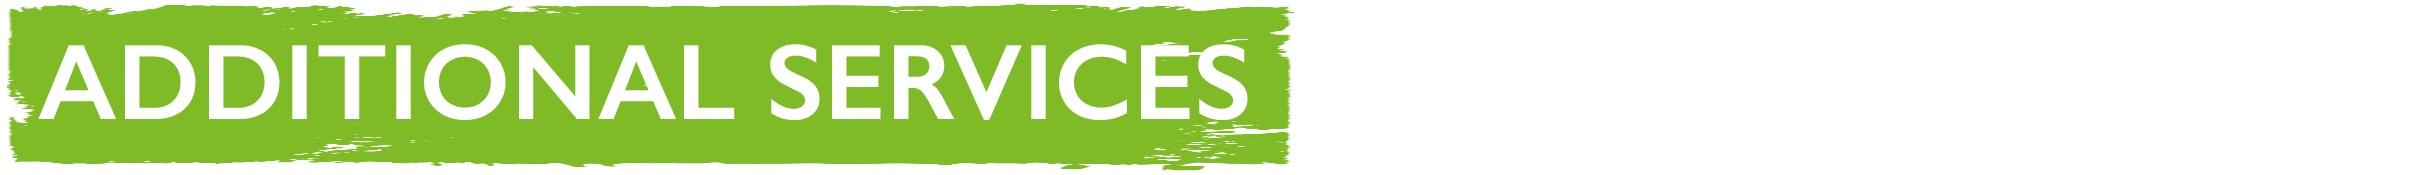 green+boxes4.jpg